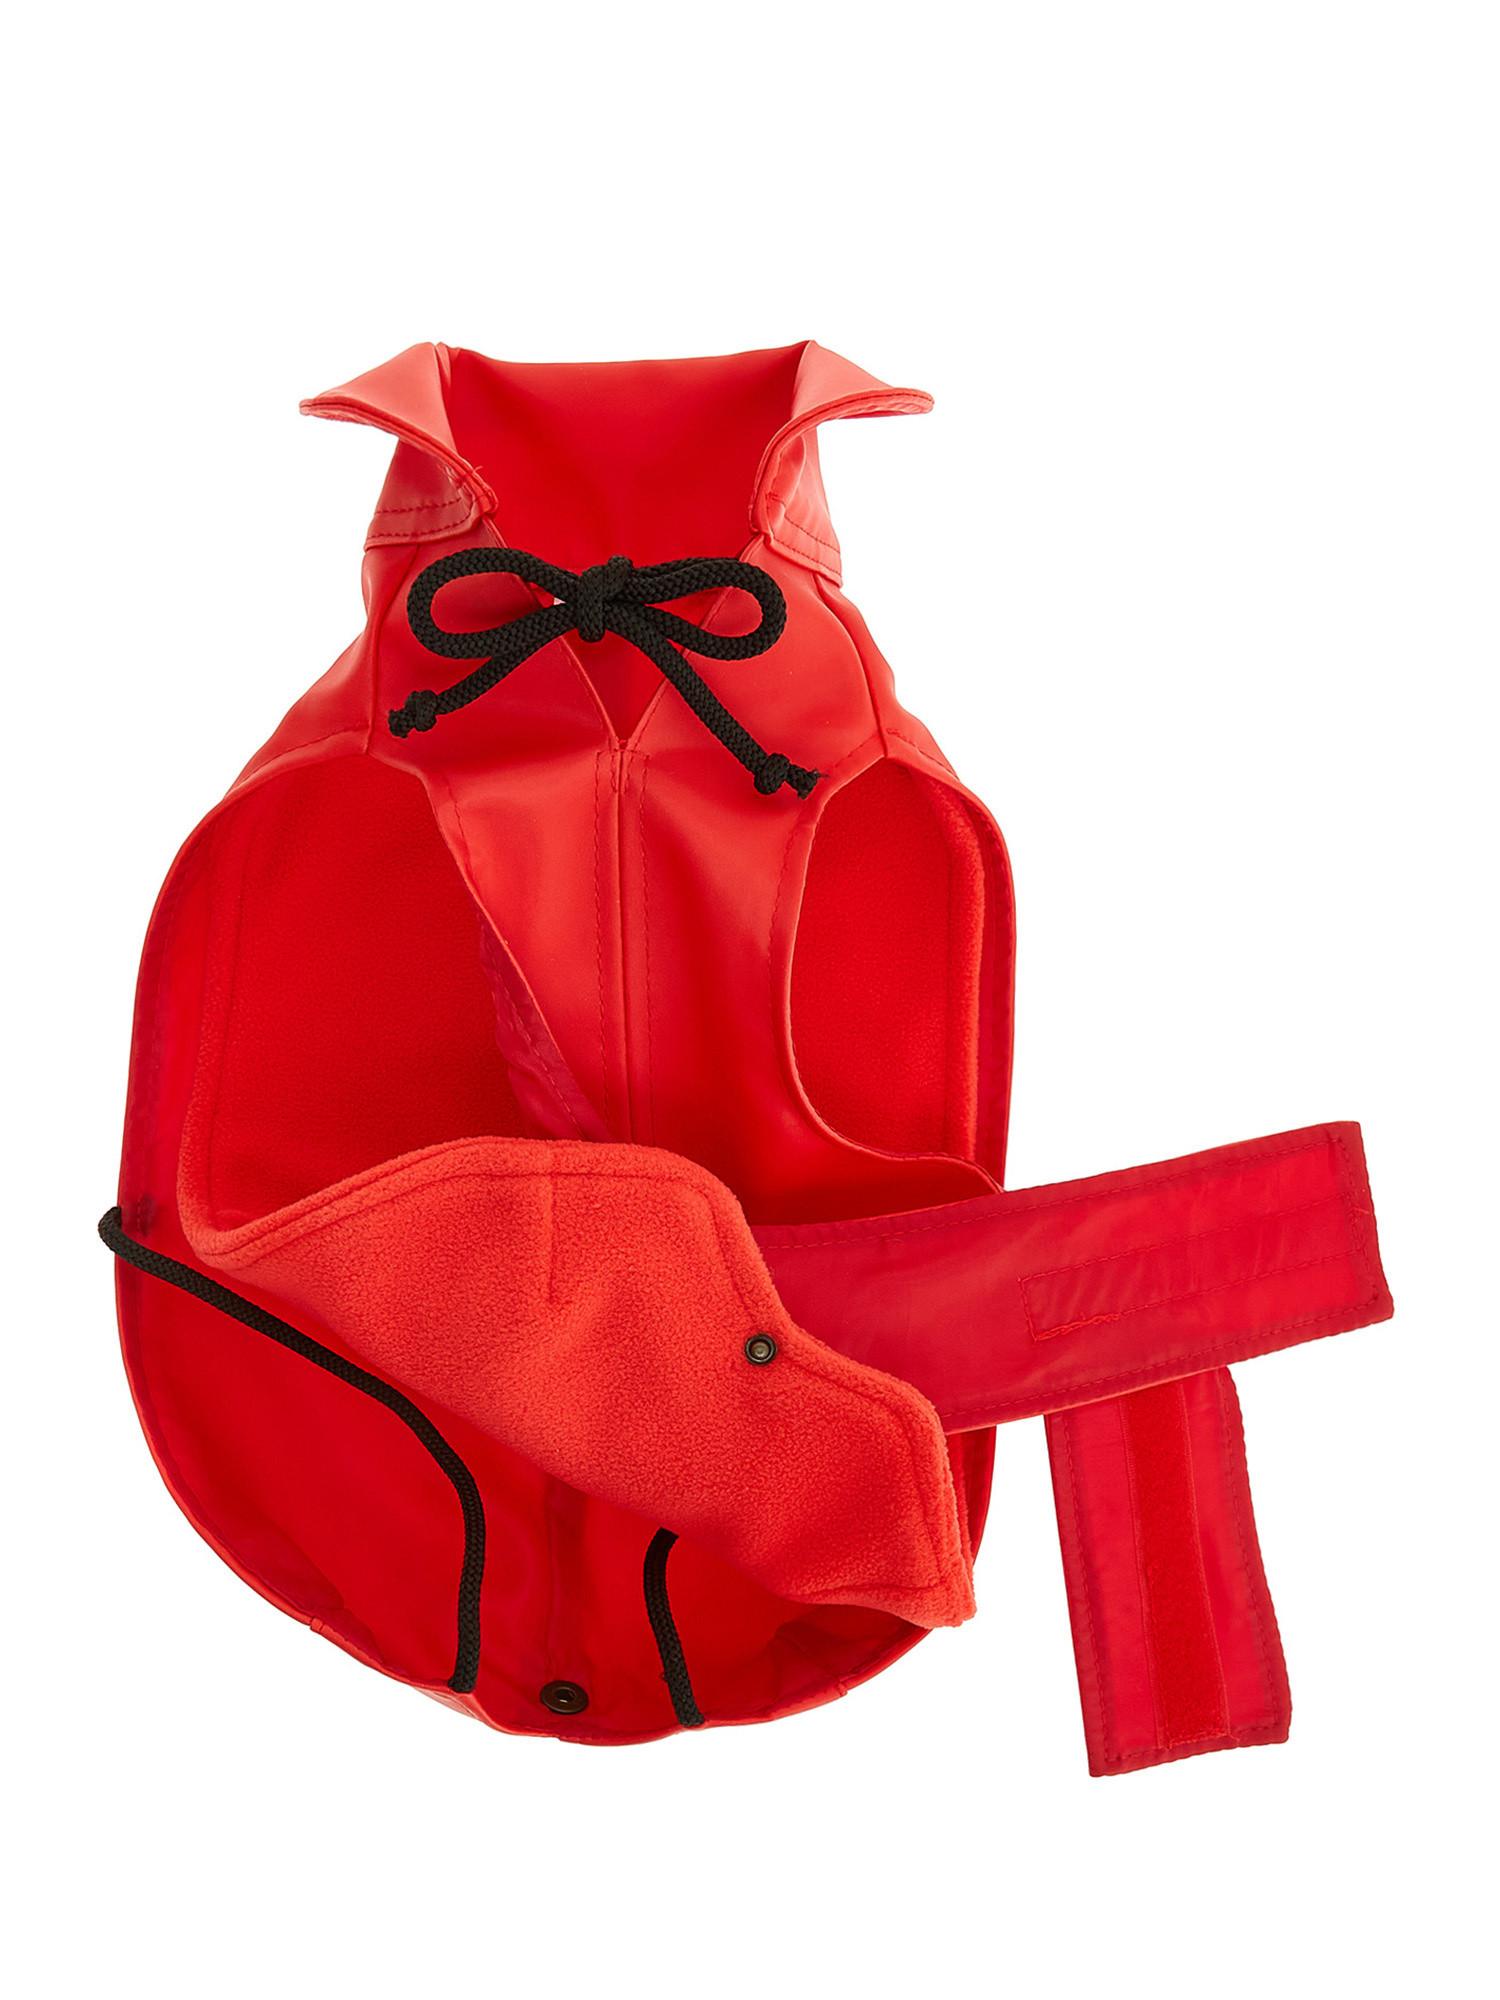 Cappottino tessuto impermeabile traspirante London, Rosso, large image number 6